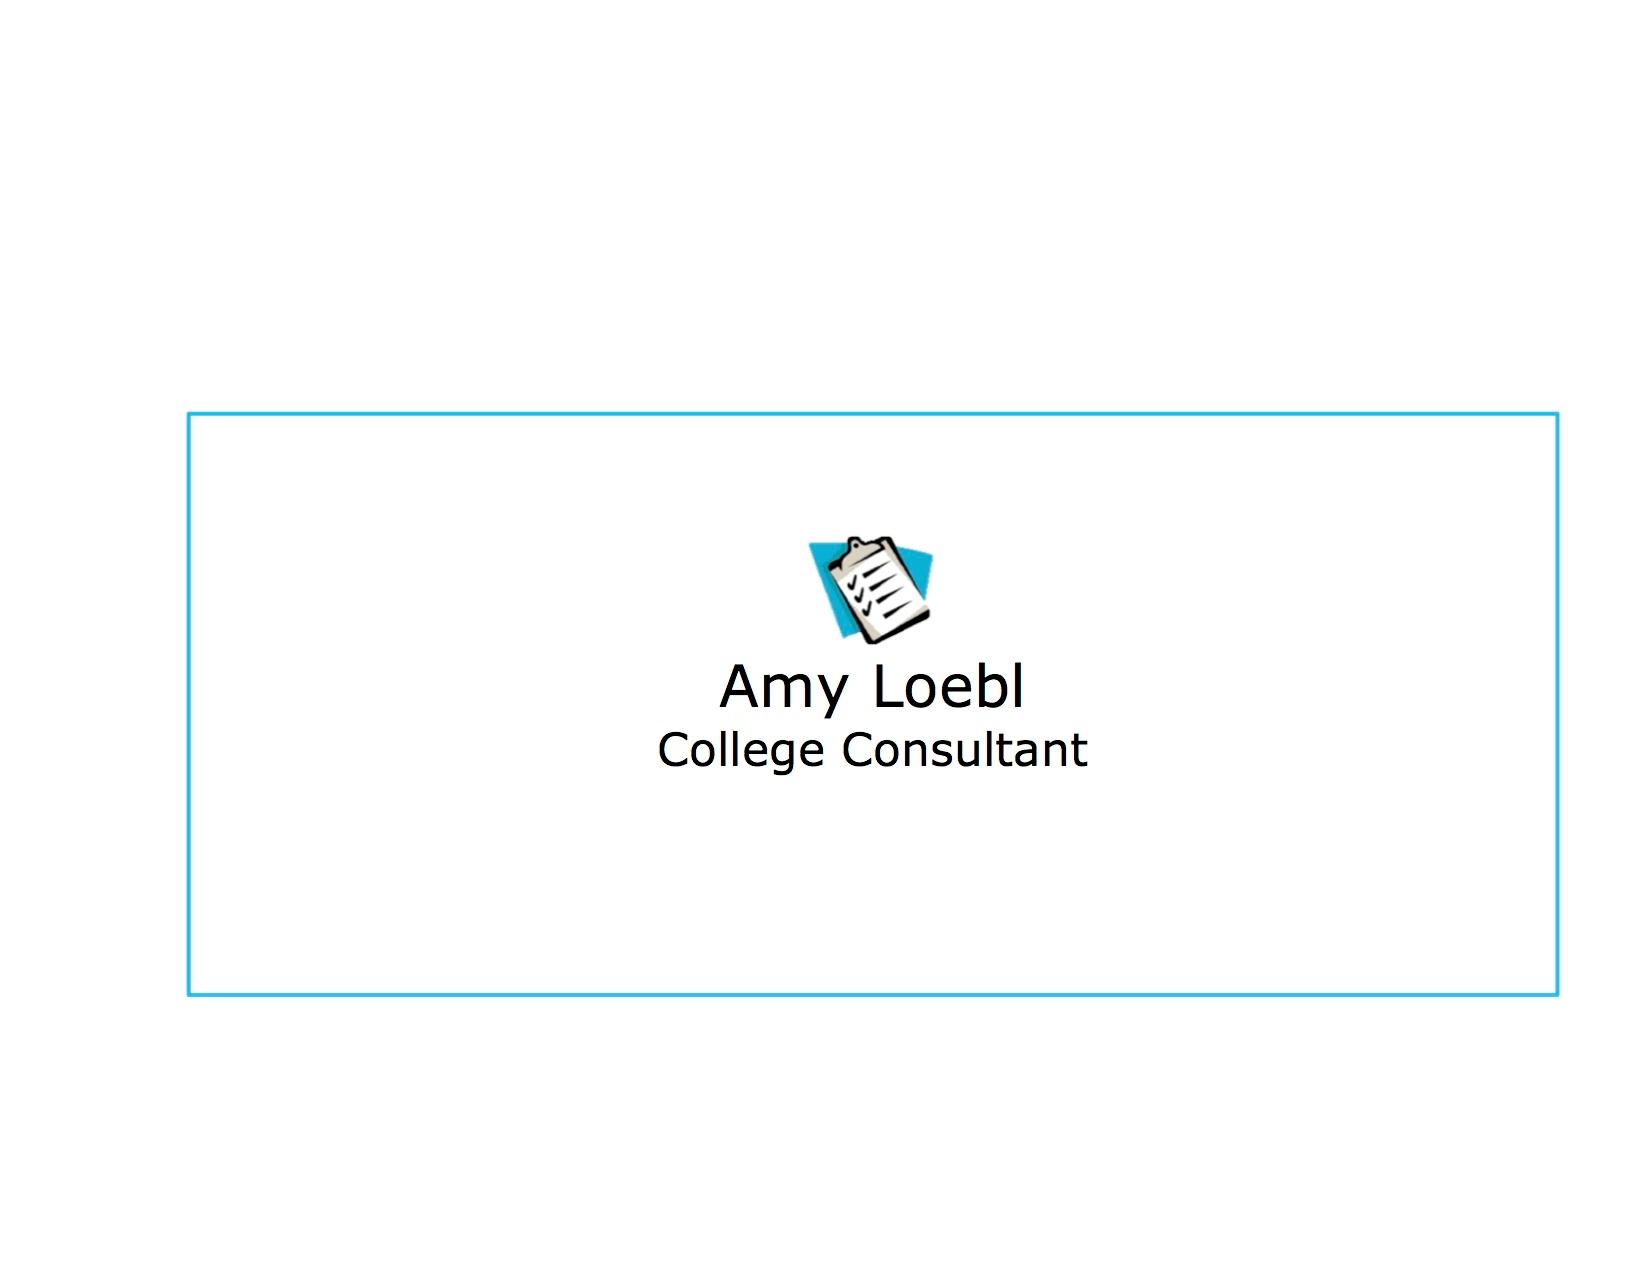 Amy Loebl - College Consultant image 0